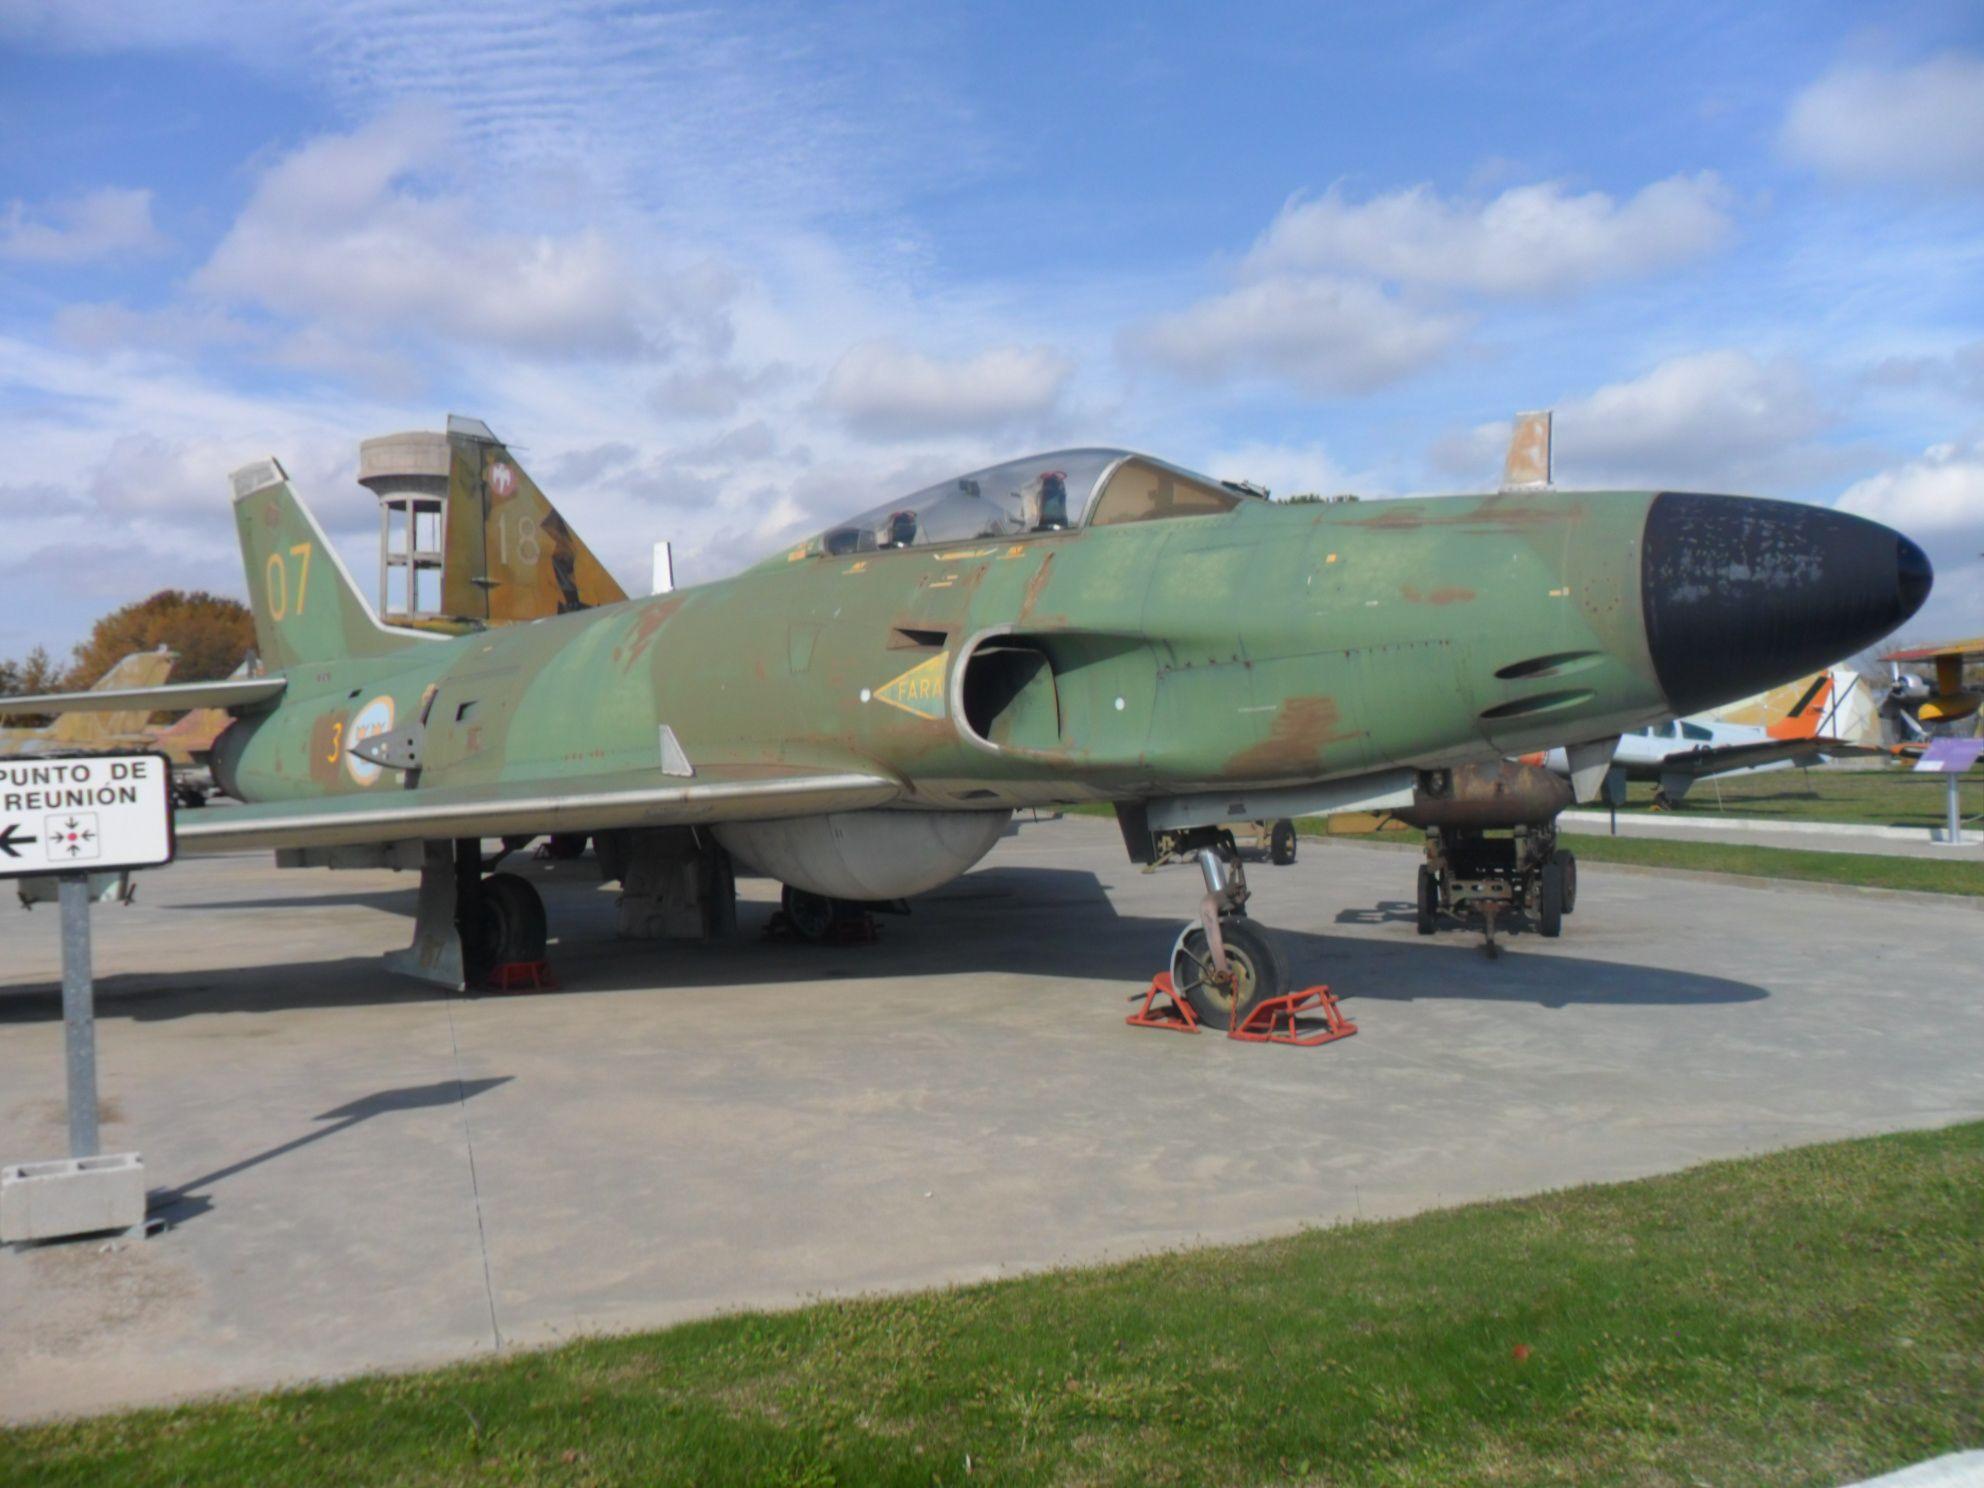 Saab j 32 lansen saab j 32 lansen pinterest aircraft and planes fandeluxe Image collections